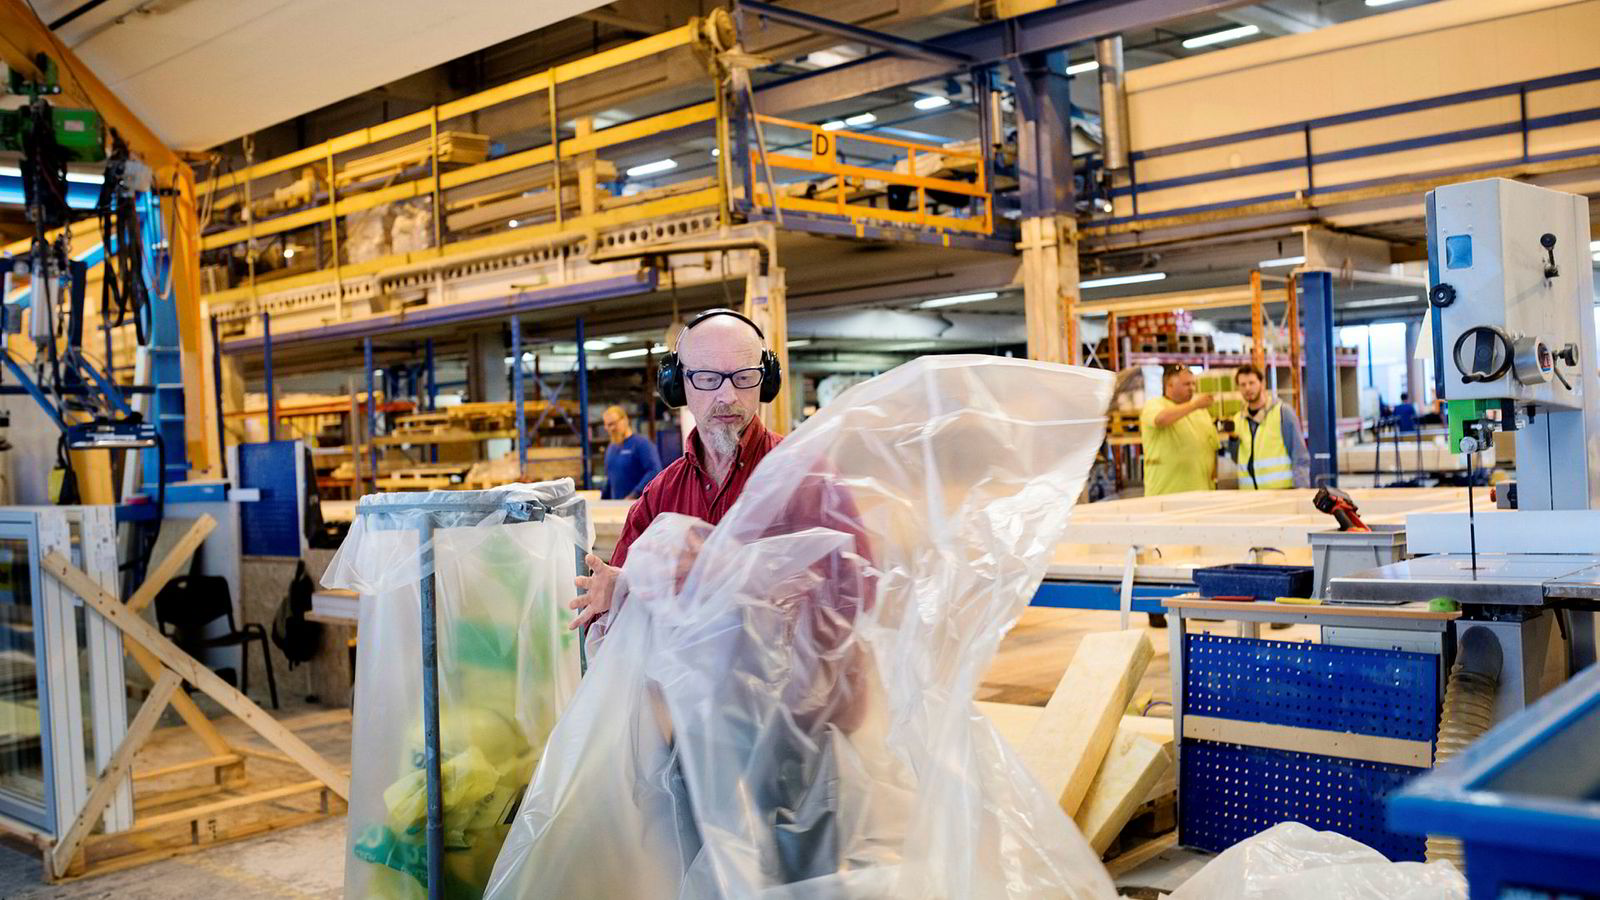 Oddbjørn Johannessen arbeider på fabrikken til Moelven Byggmodul. Der har han jobbet siden 1989. Johannessen sier at flere der er misfornøyde med Aps frieri til Venstre.